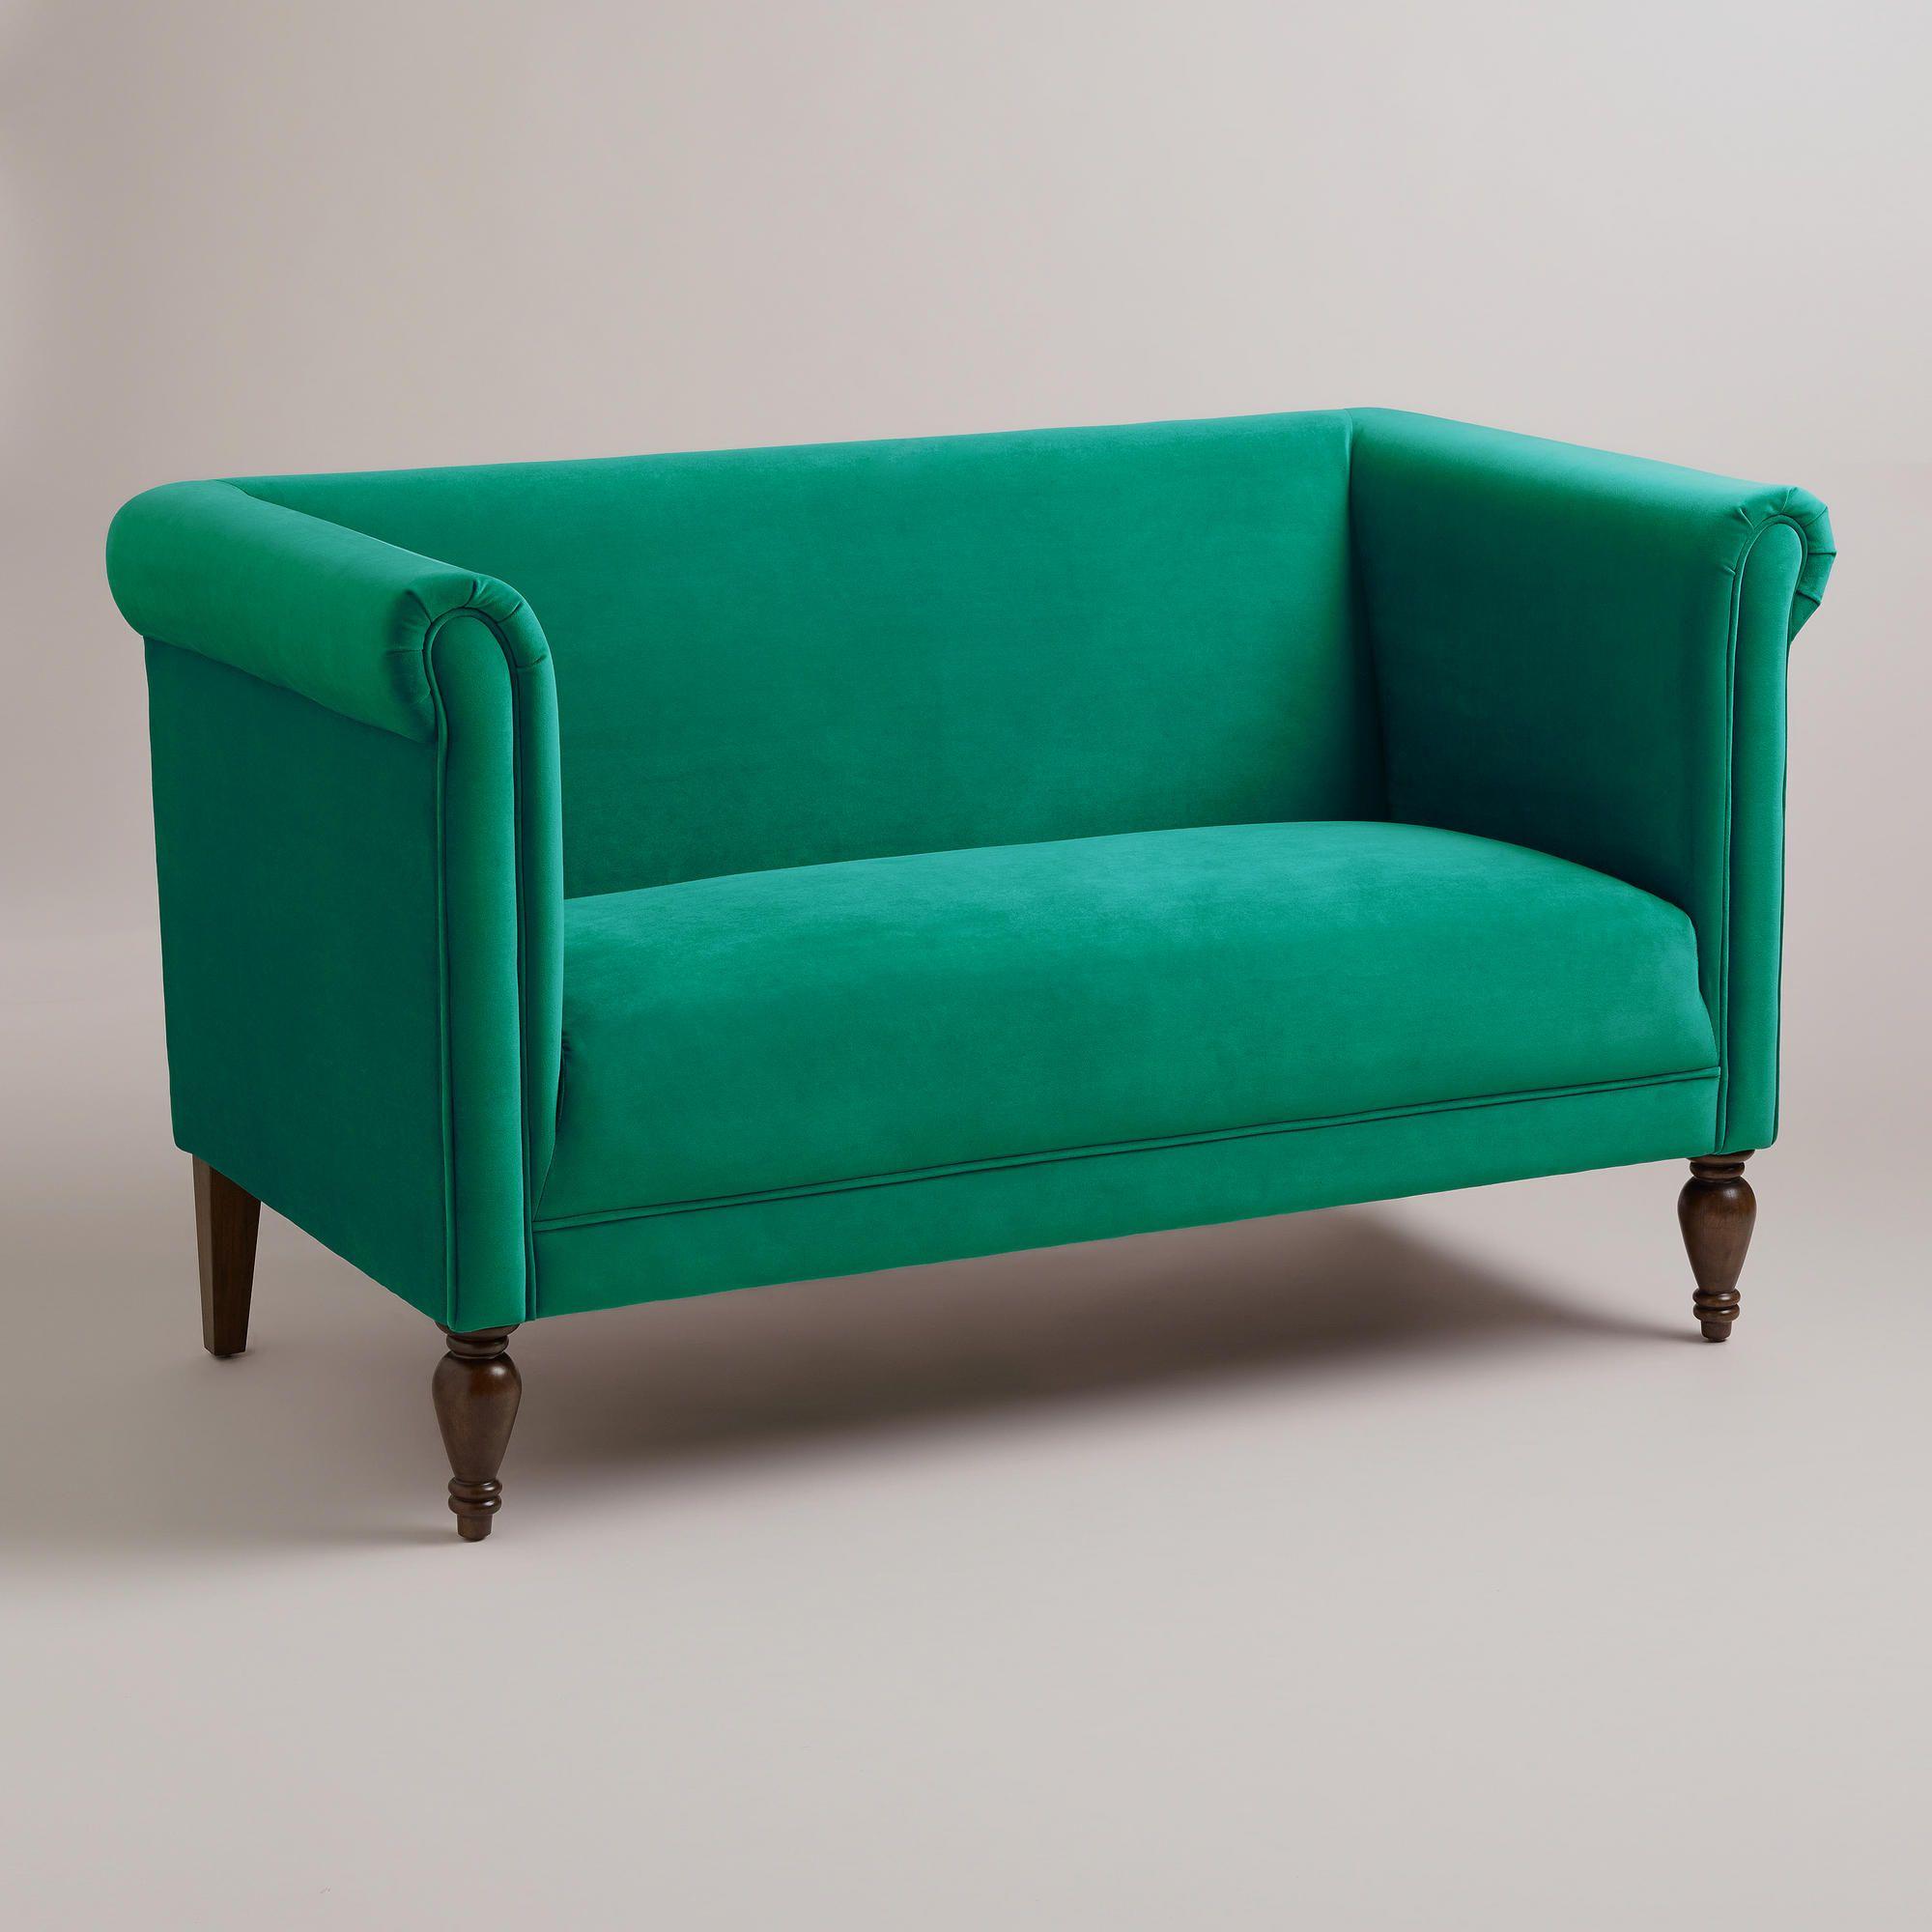 Cost Plus Furniture Sale: Home Decor - Emerald Marian Loveseat